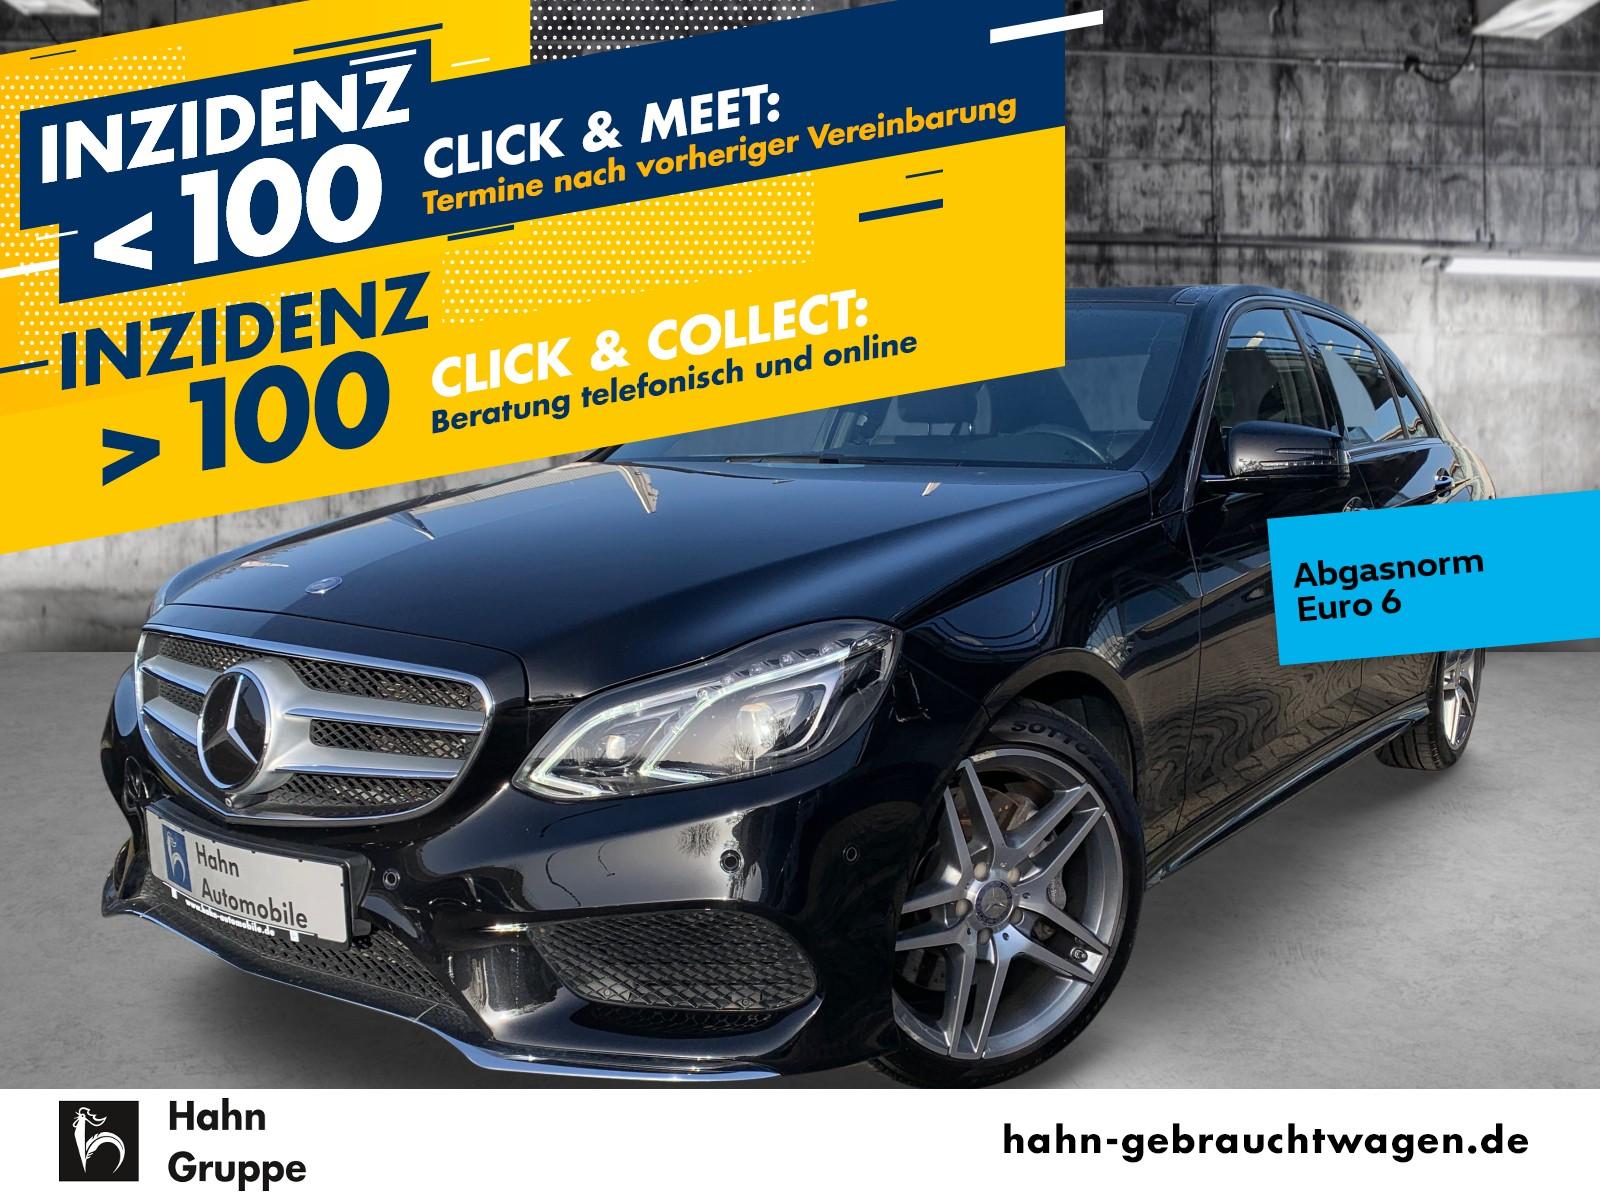 Mercedes-Benz E 400 4M AMG-Paket 7G-Tronic Navi LED Pano Luft, Jahr 2015, Benzin